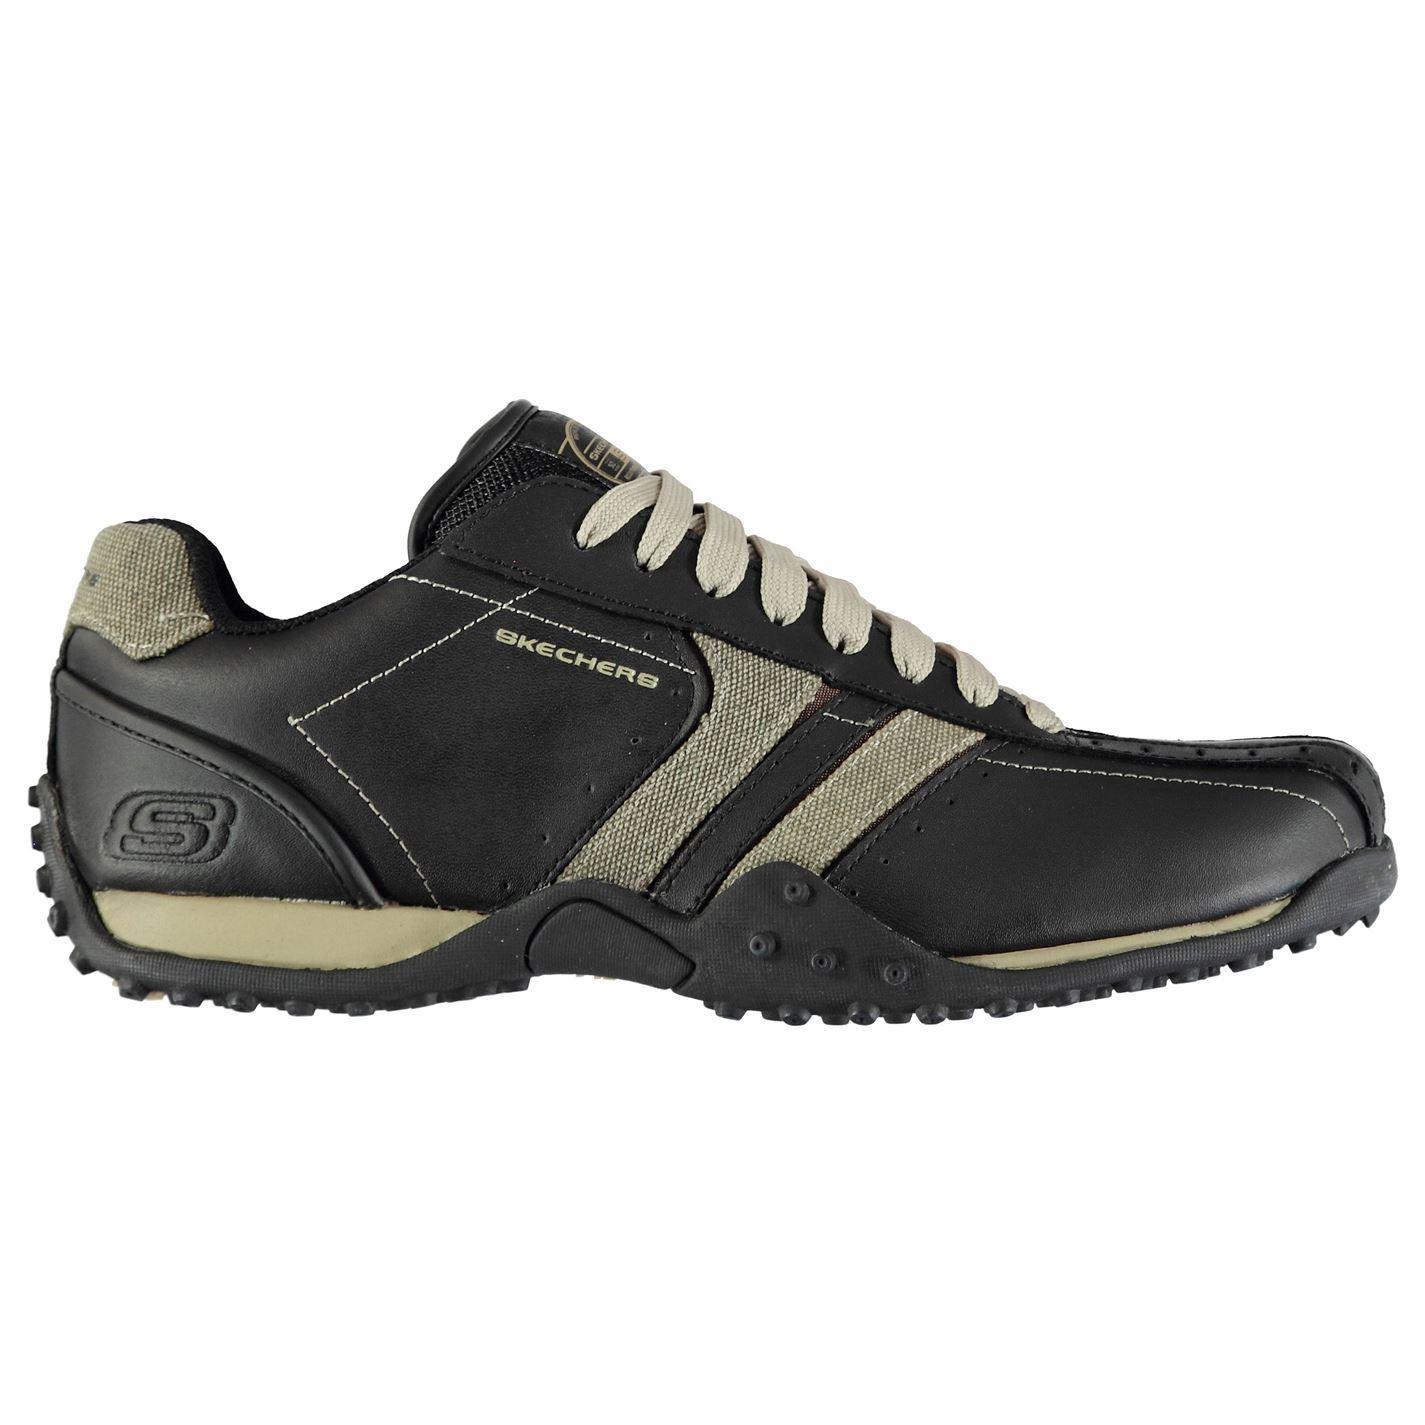 Skechers-Urban-Track-Forward-Trainers-Mens-Athleisure-Footwear-Shoes-Sneakers thumbnail 7